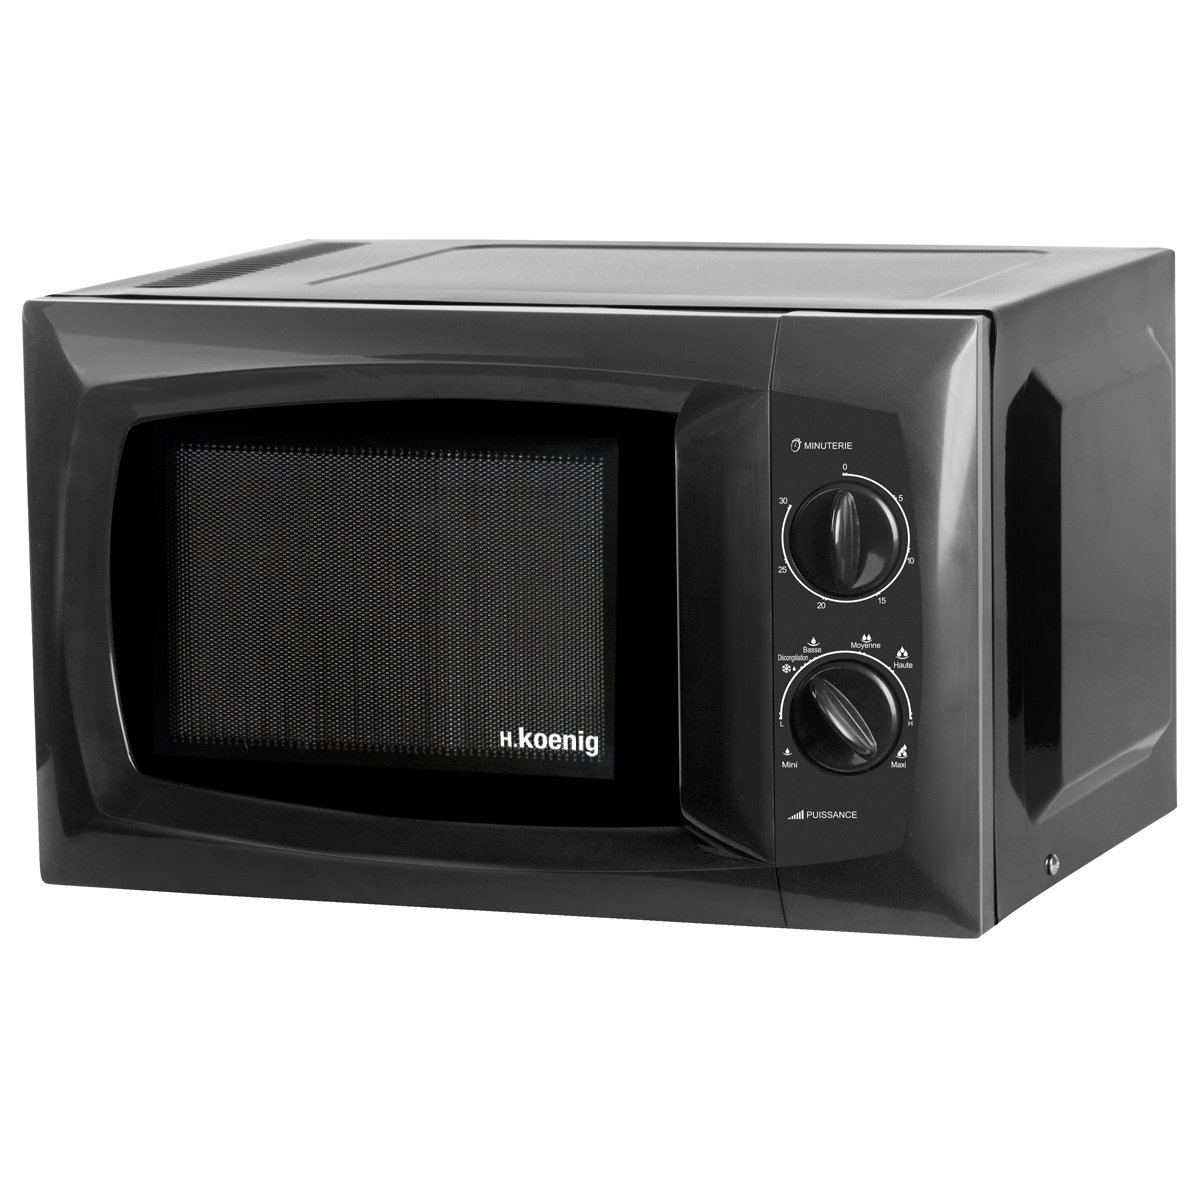 H.Koenig VIO5 - Microondas, 700 W, 20 l, color negro 80143